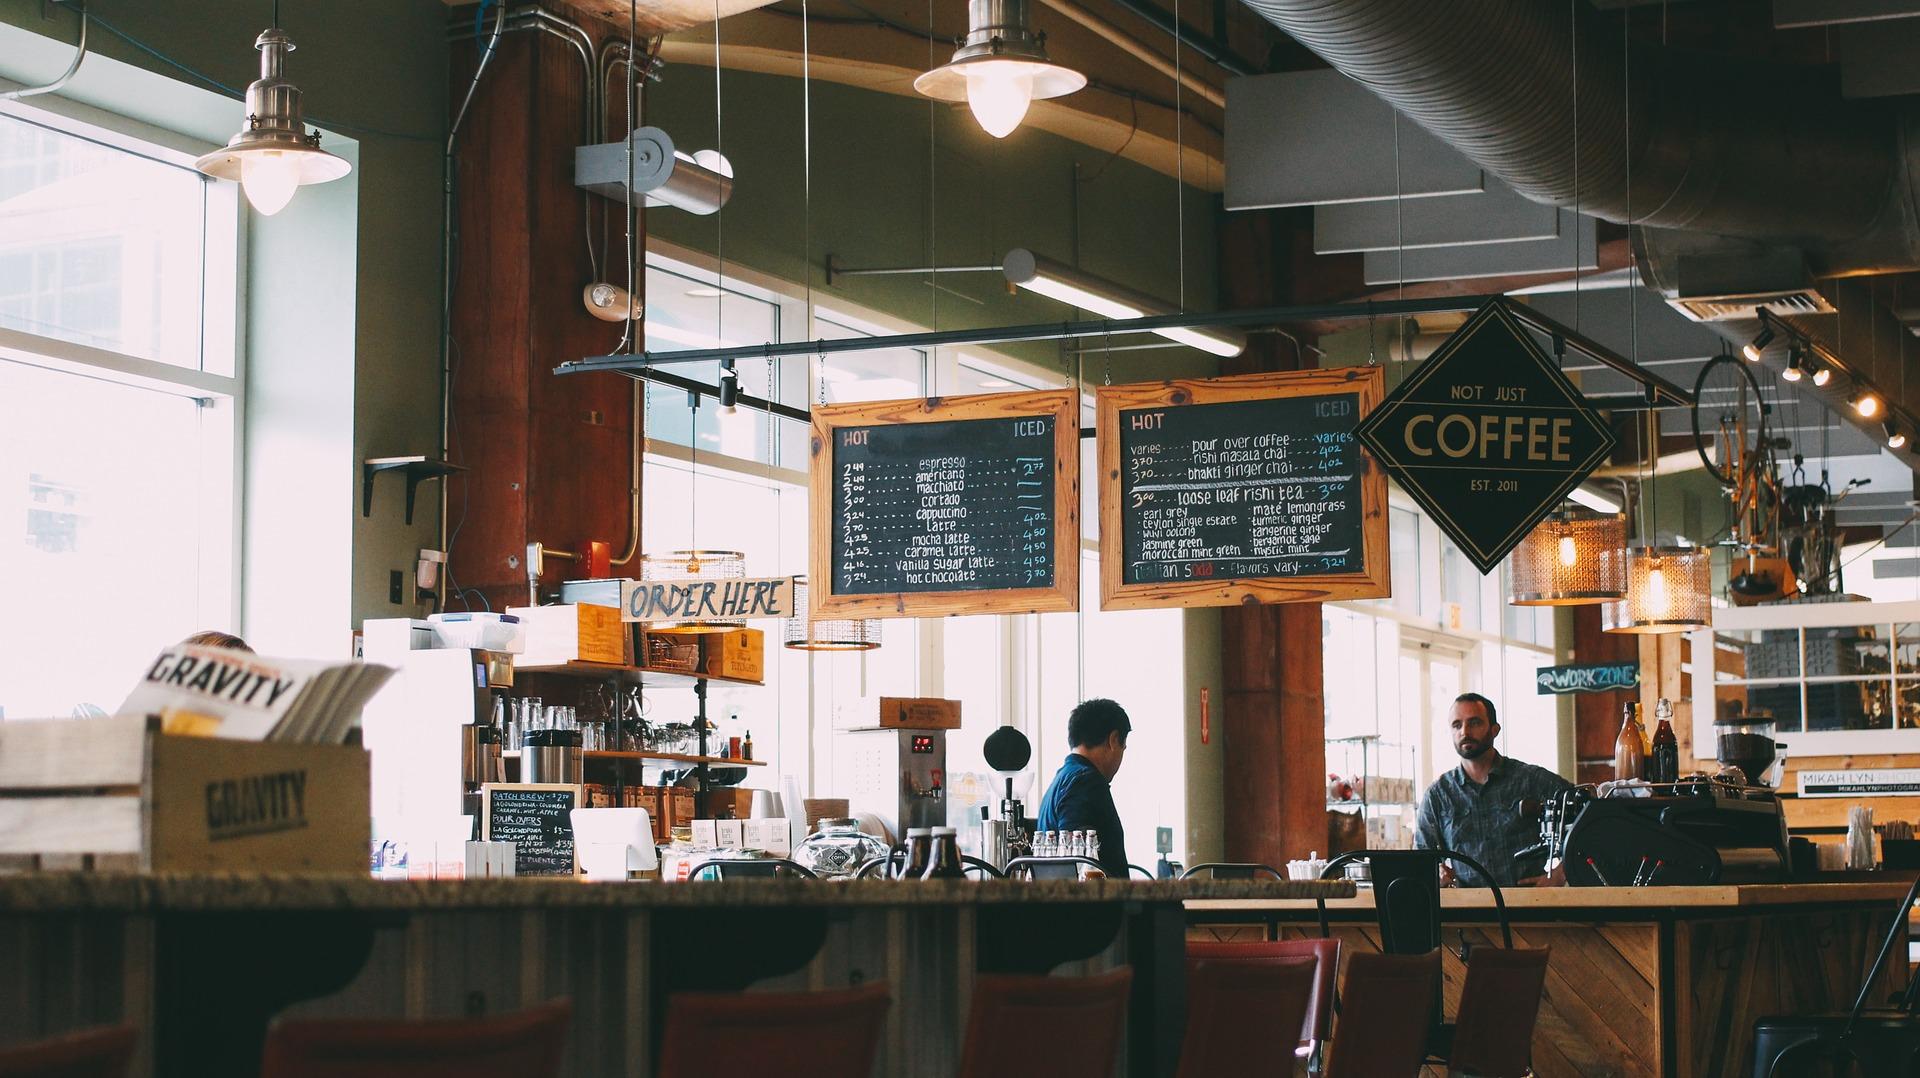 You are currently viewing カフェでおしゃべりを深化させるように問題を解決しよう:ワールド・カフェ